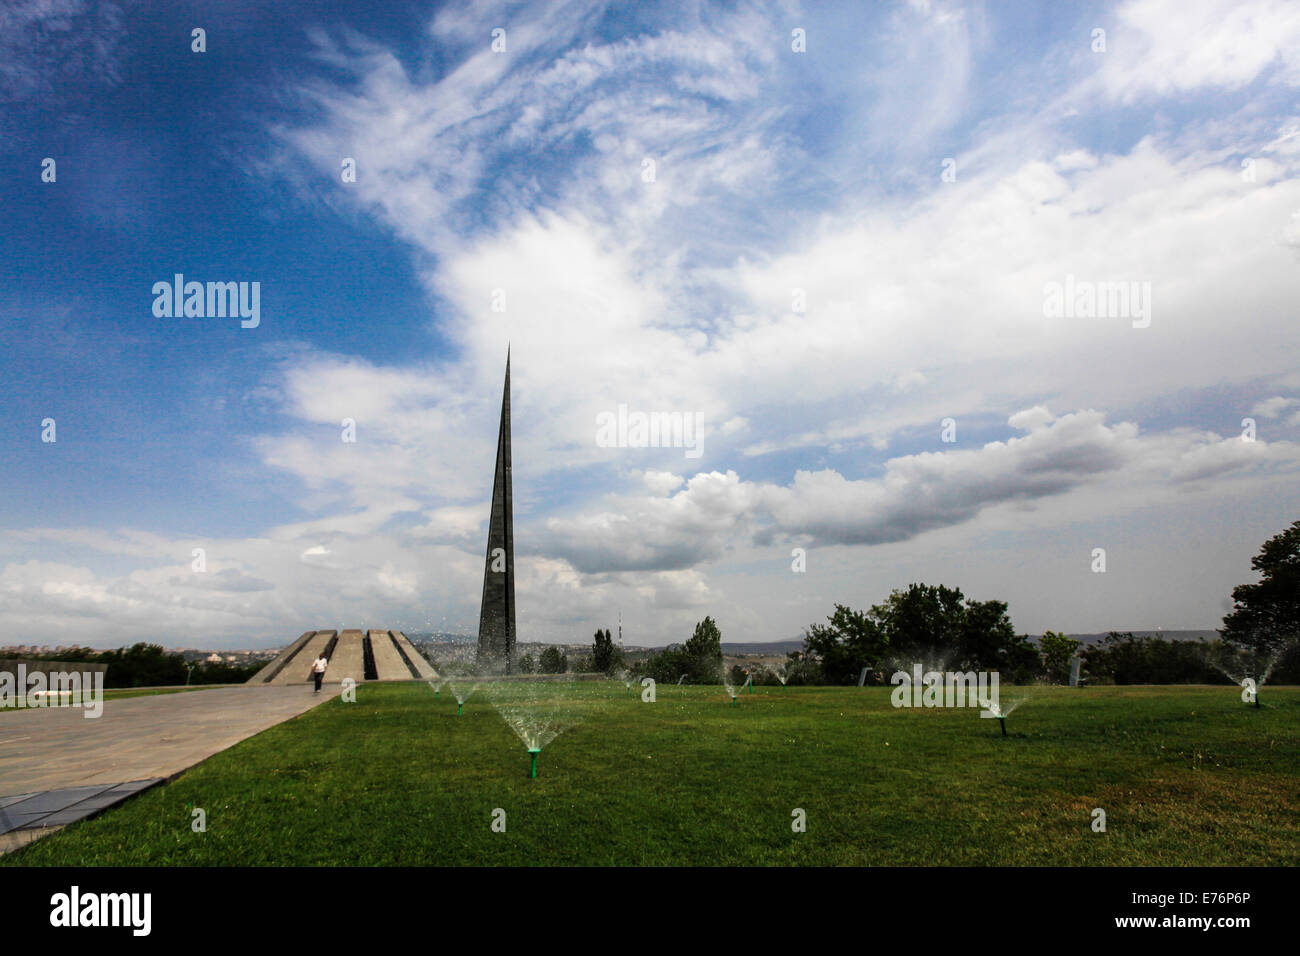 Armenia, Yerevan, Tsitsernakaberd, Museum and Memorial of the 1915 Armenian Genocide - Stock Image